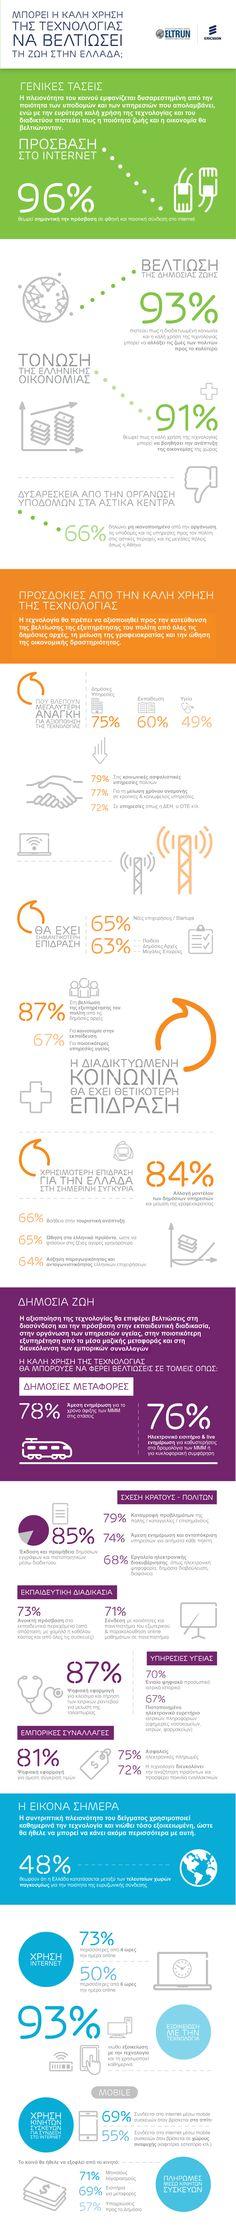 Infographic για τα αποτελέσματα της έρευνας της Ericsson για το πως μπορεί η καλή χρήση της τεχνολογίας να βελτιώσει τη ζωή στην Ελλάδα